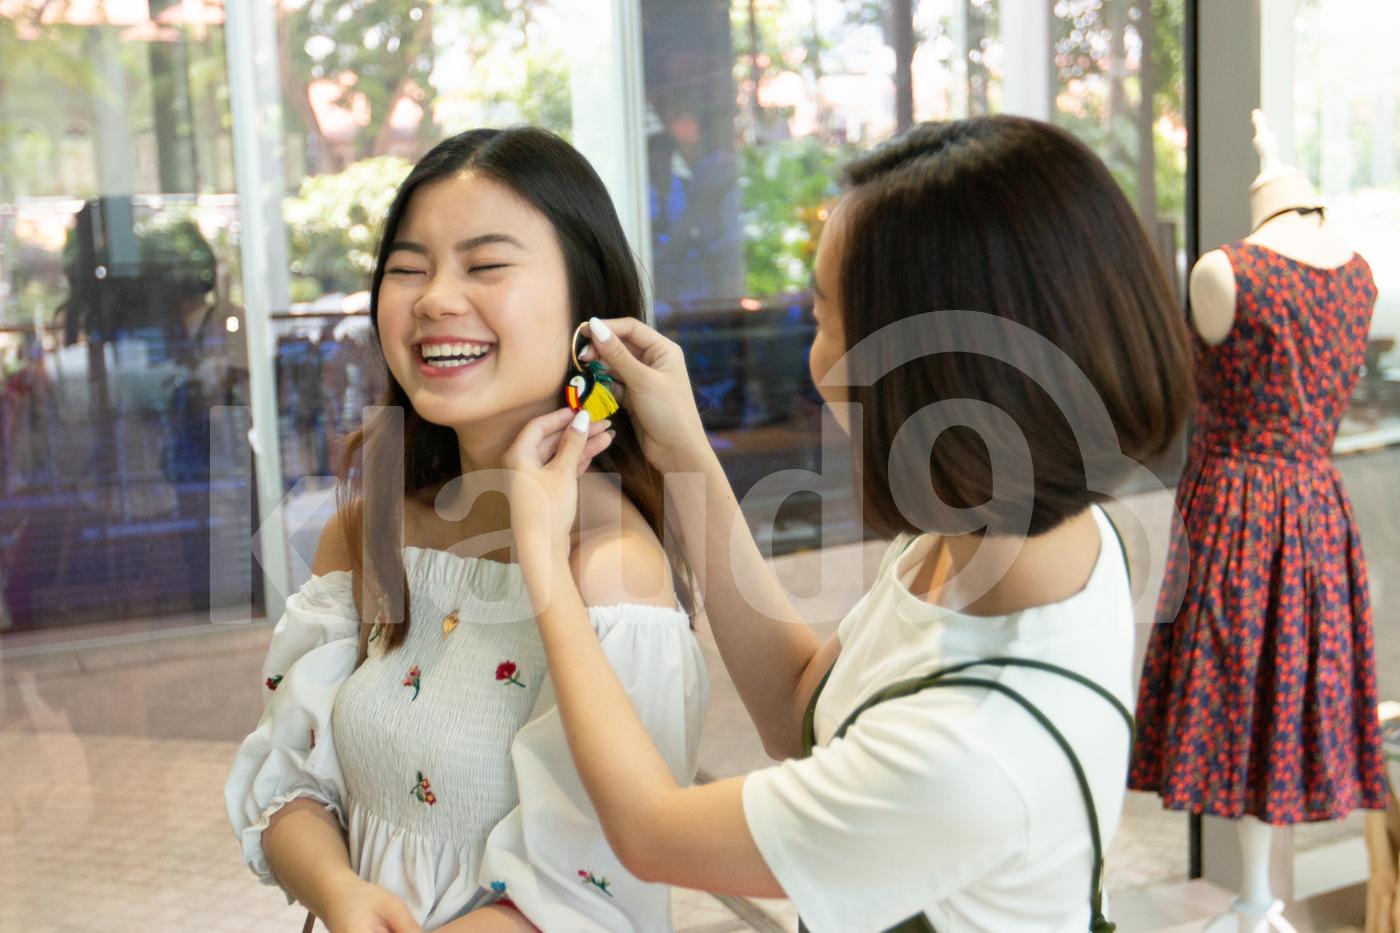 Young Asian women trying earrings on in a shop